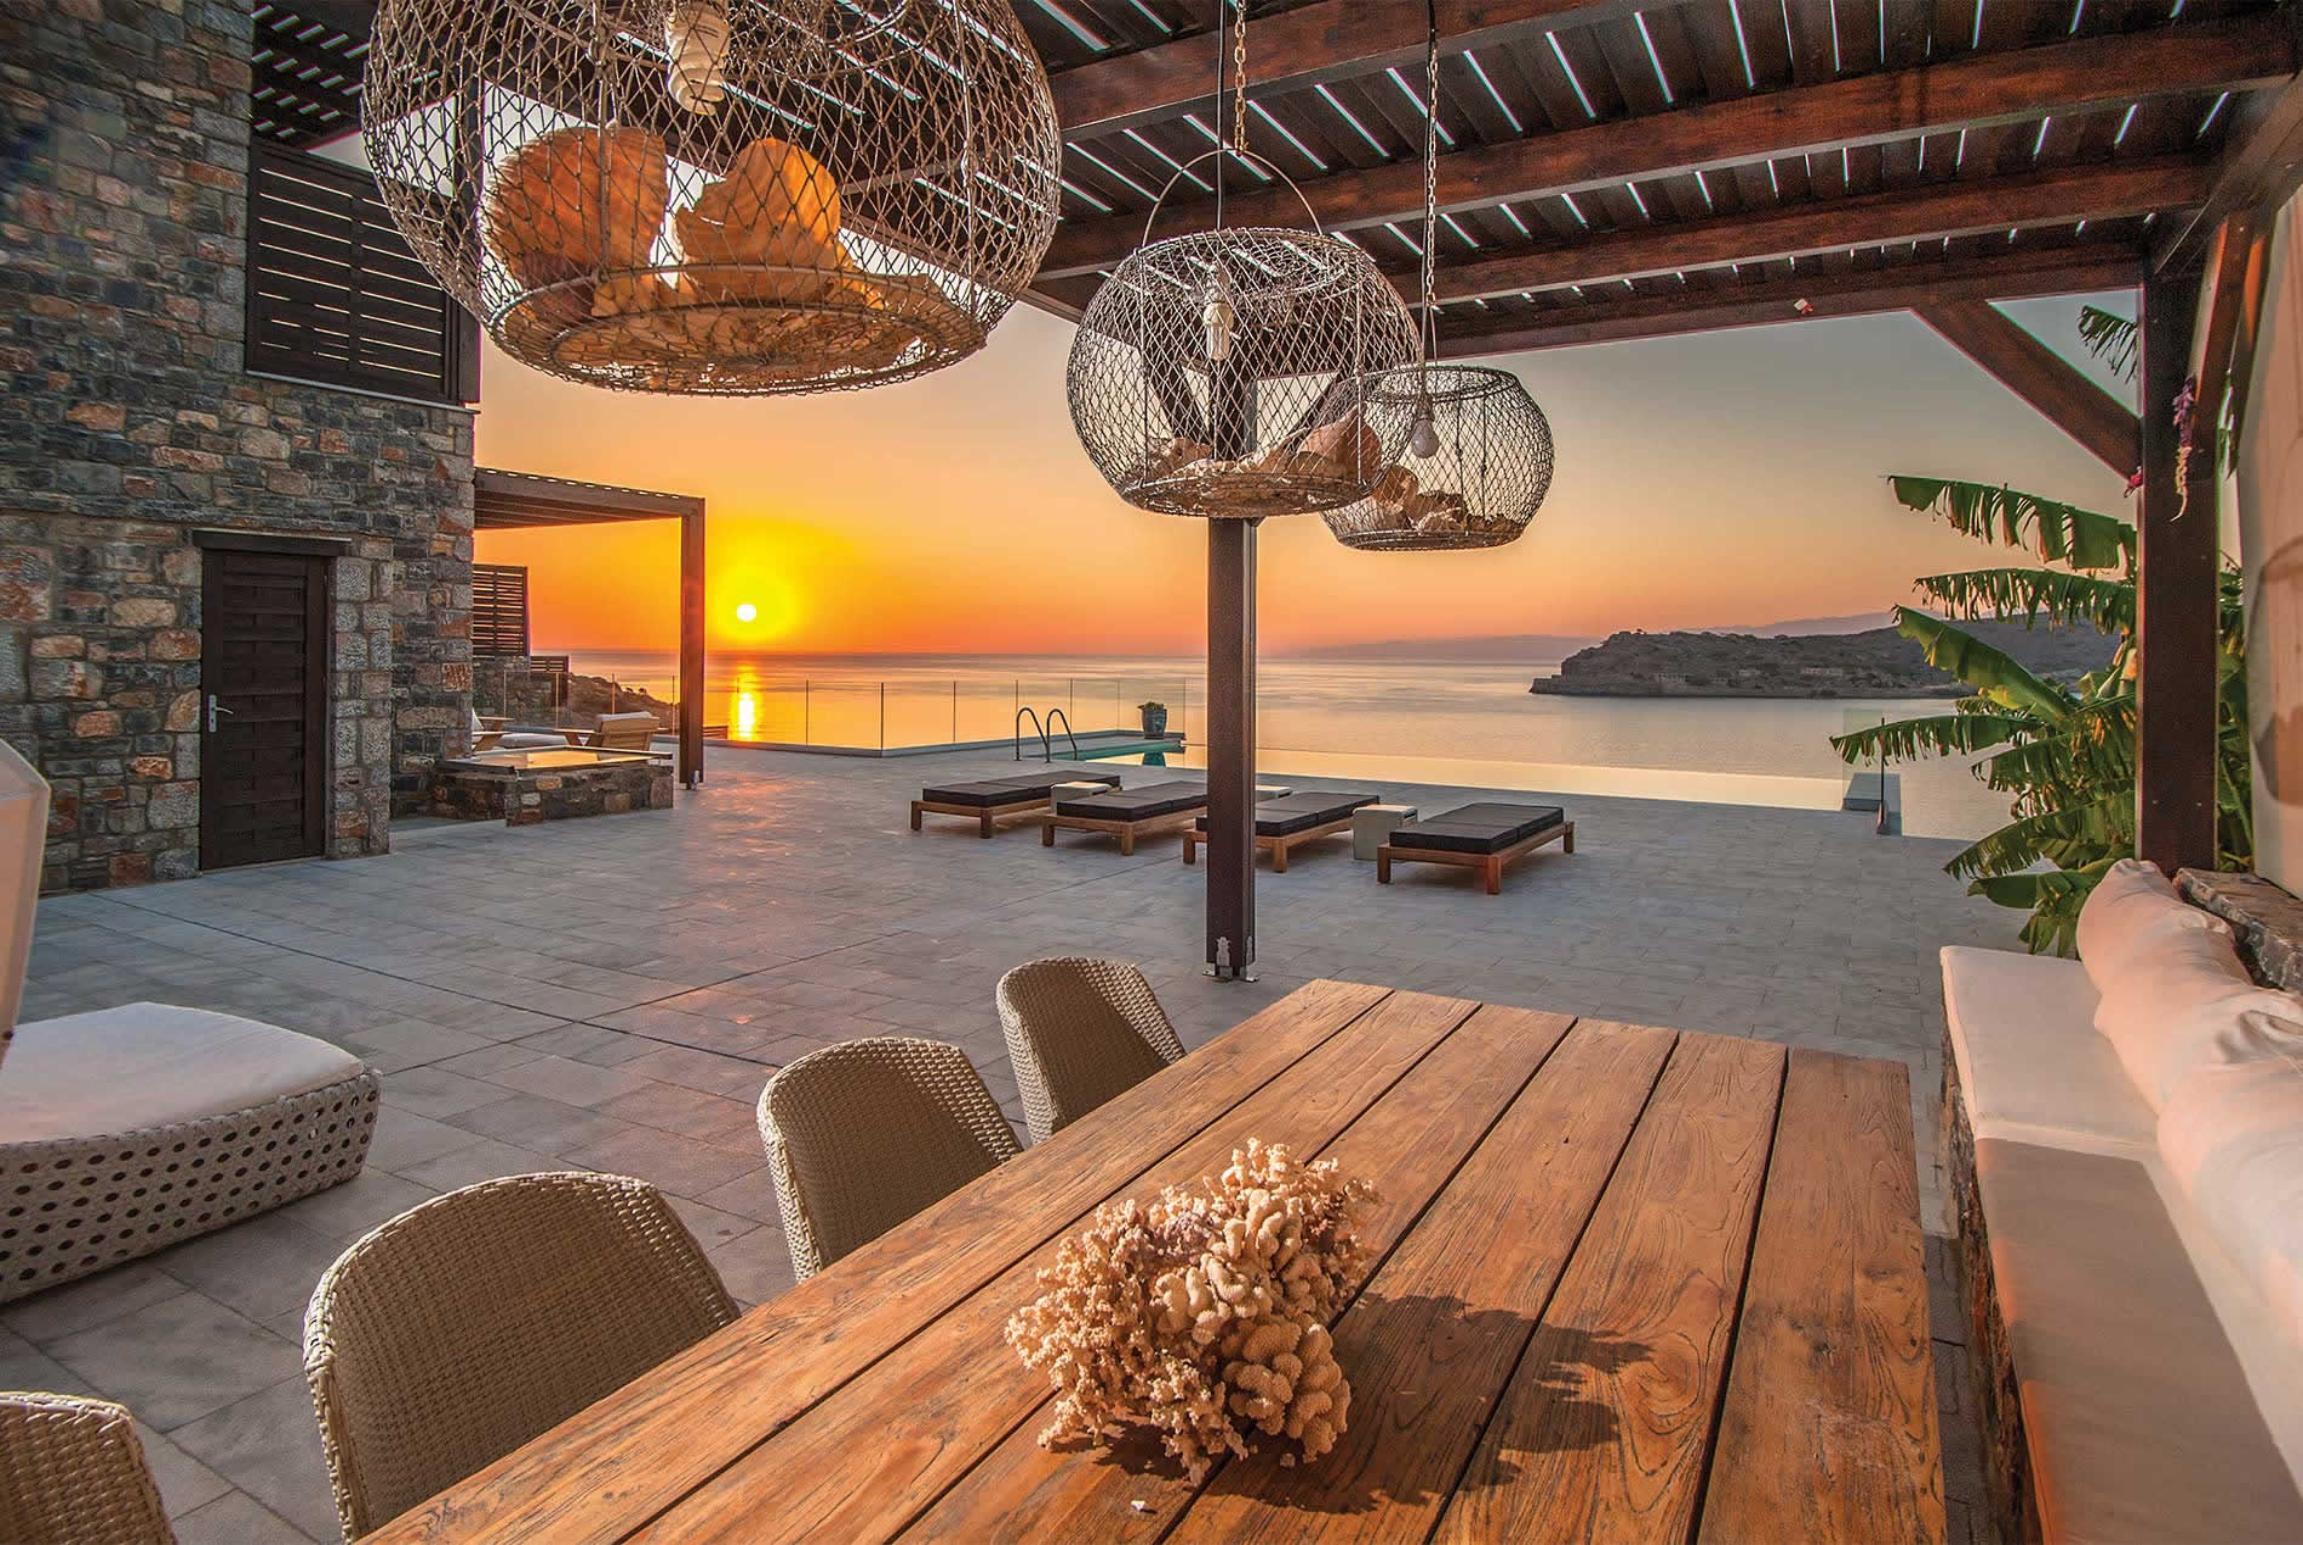 Ferienhaus Danae (2654195), Plaka, Kreta Nordküste, Kreta, Griechenland, Bild 24